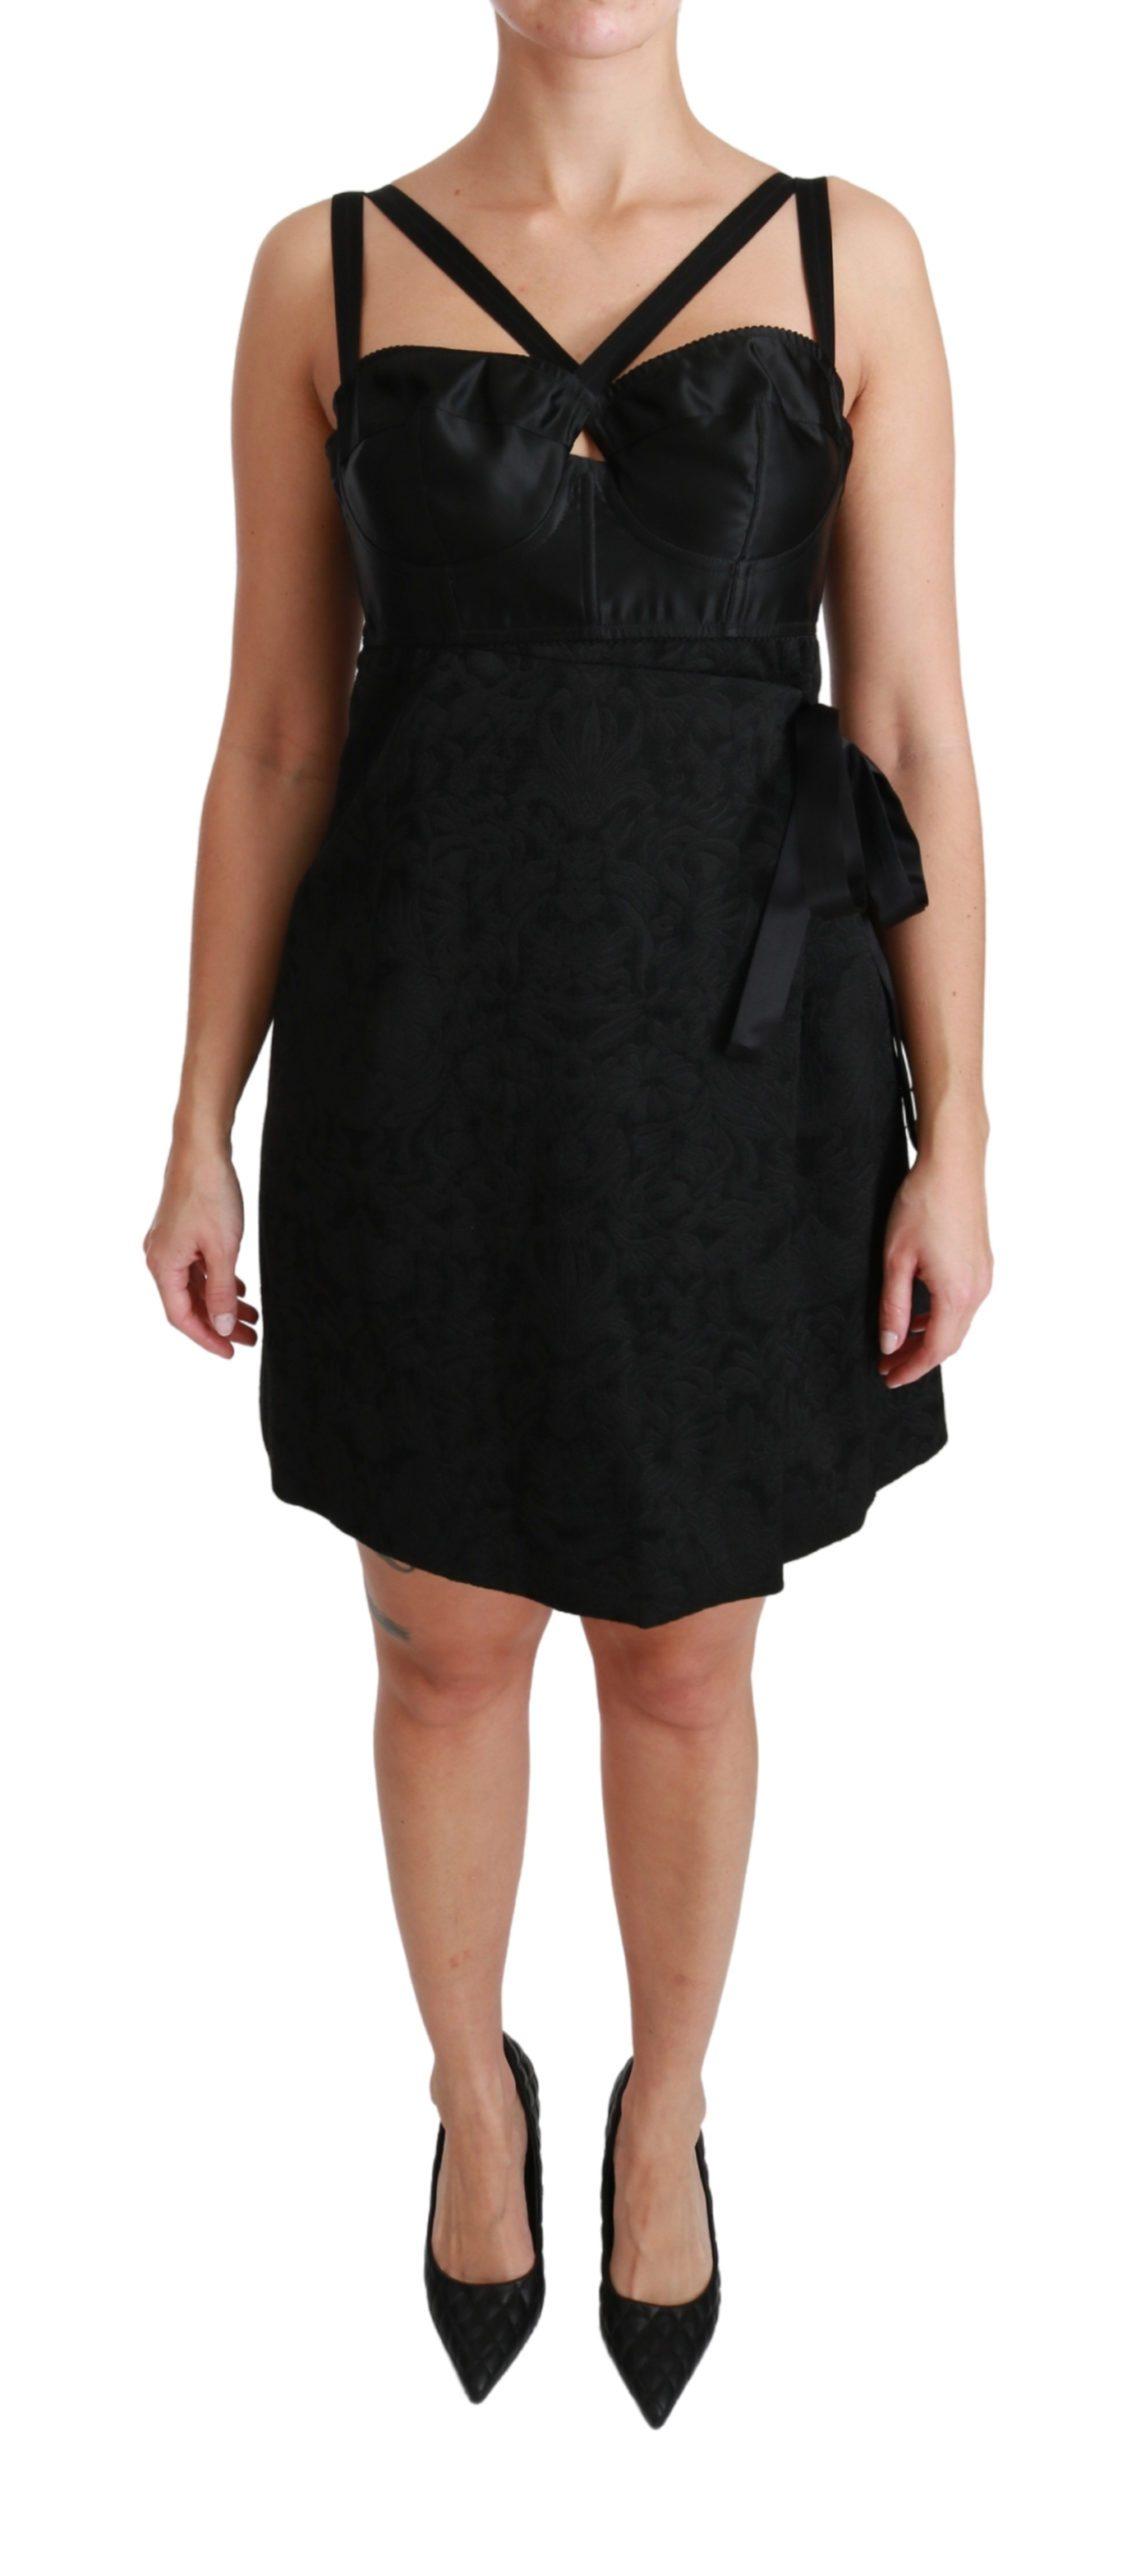 Dolce & Gabbana Women's Stretch Satin Jacquard Mini Dress Black DR2497 - IT44|L